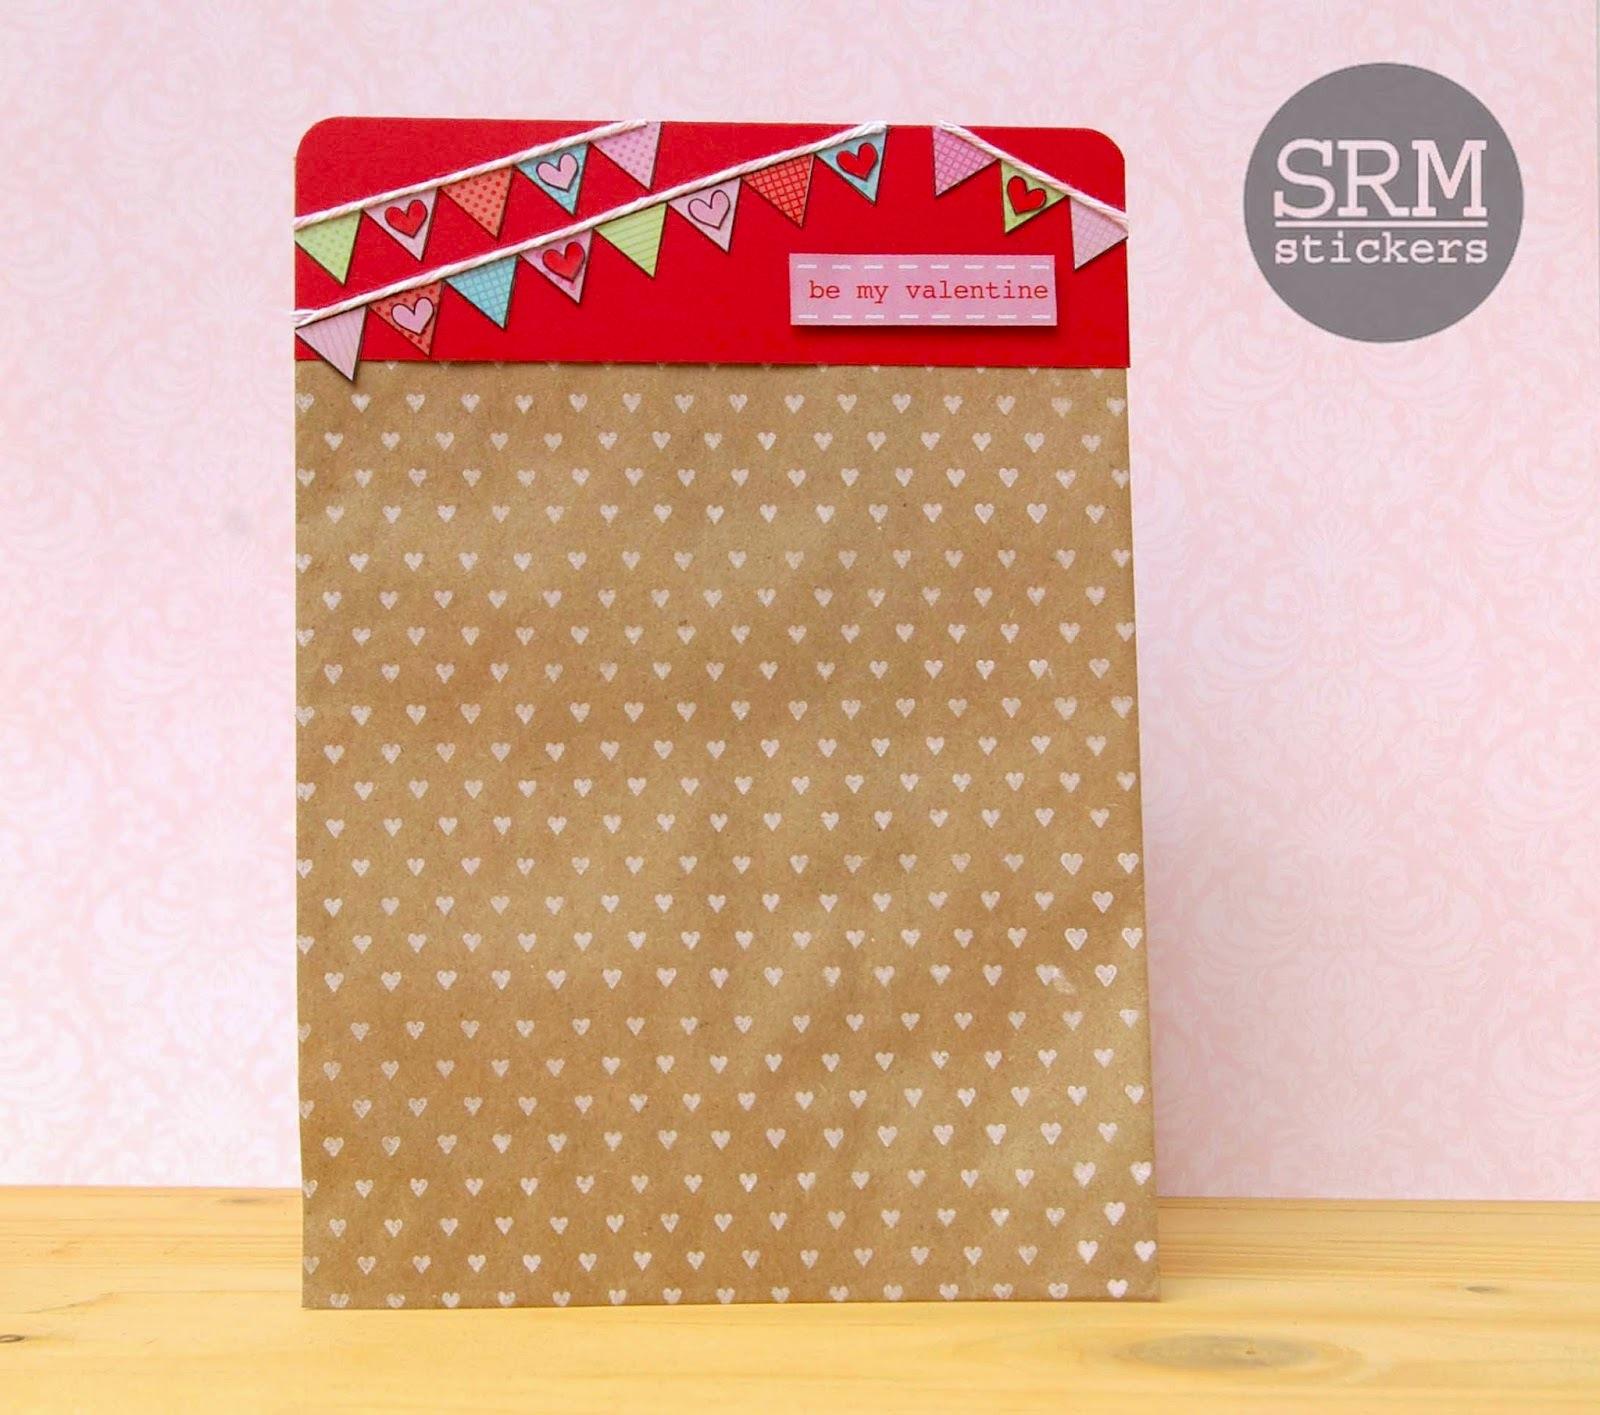 SRM Stickers Blog - Valentine Banners Treat Bag by Lorena - #kraft #bag #stamps #stickers #borders #twine #valentine #treat